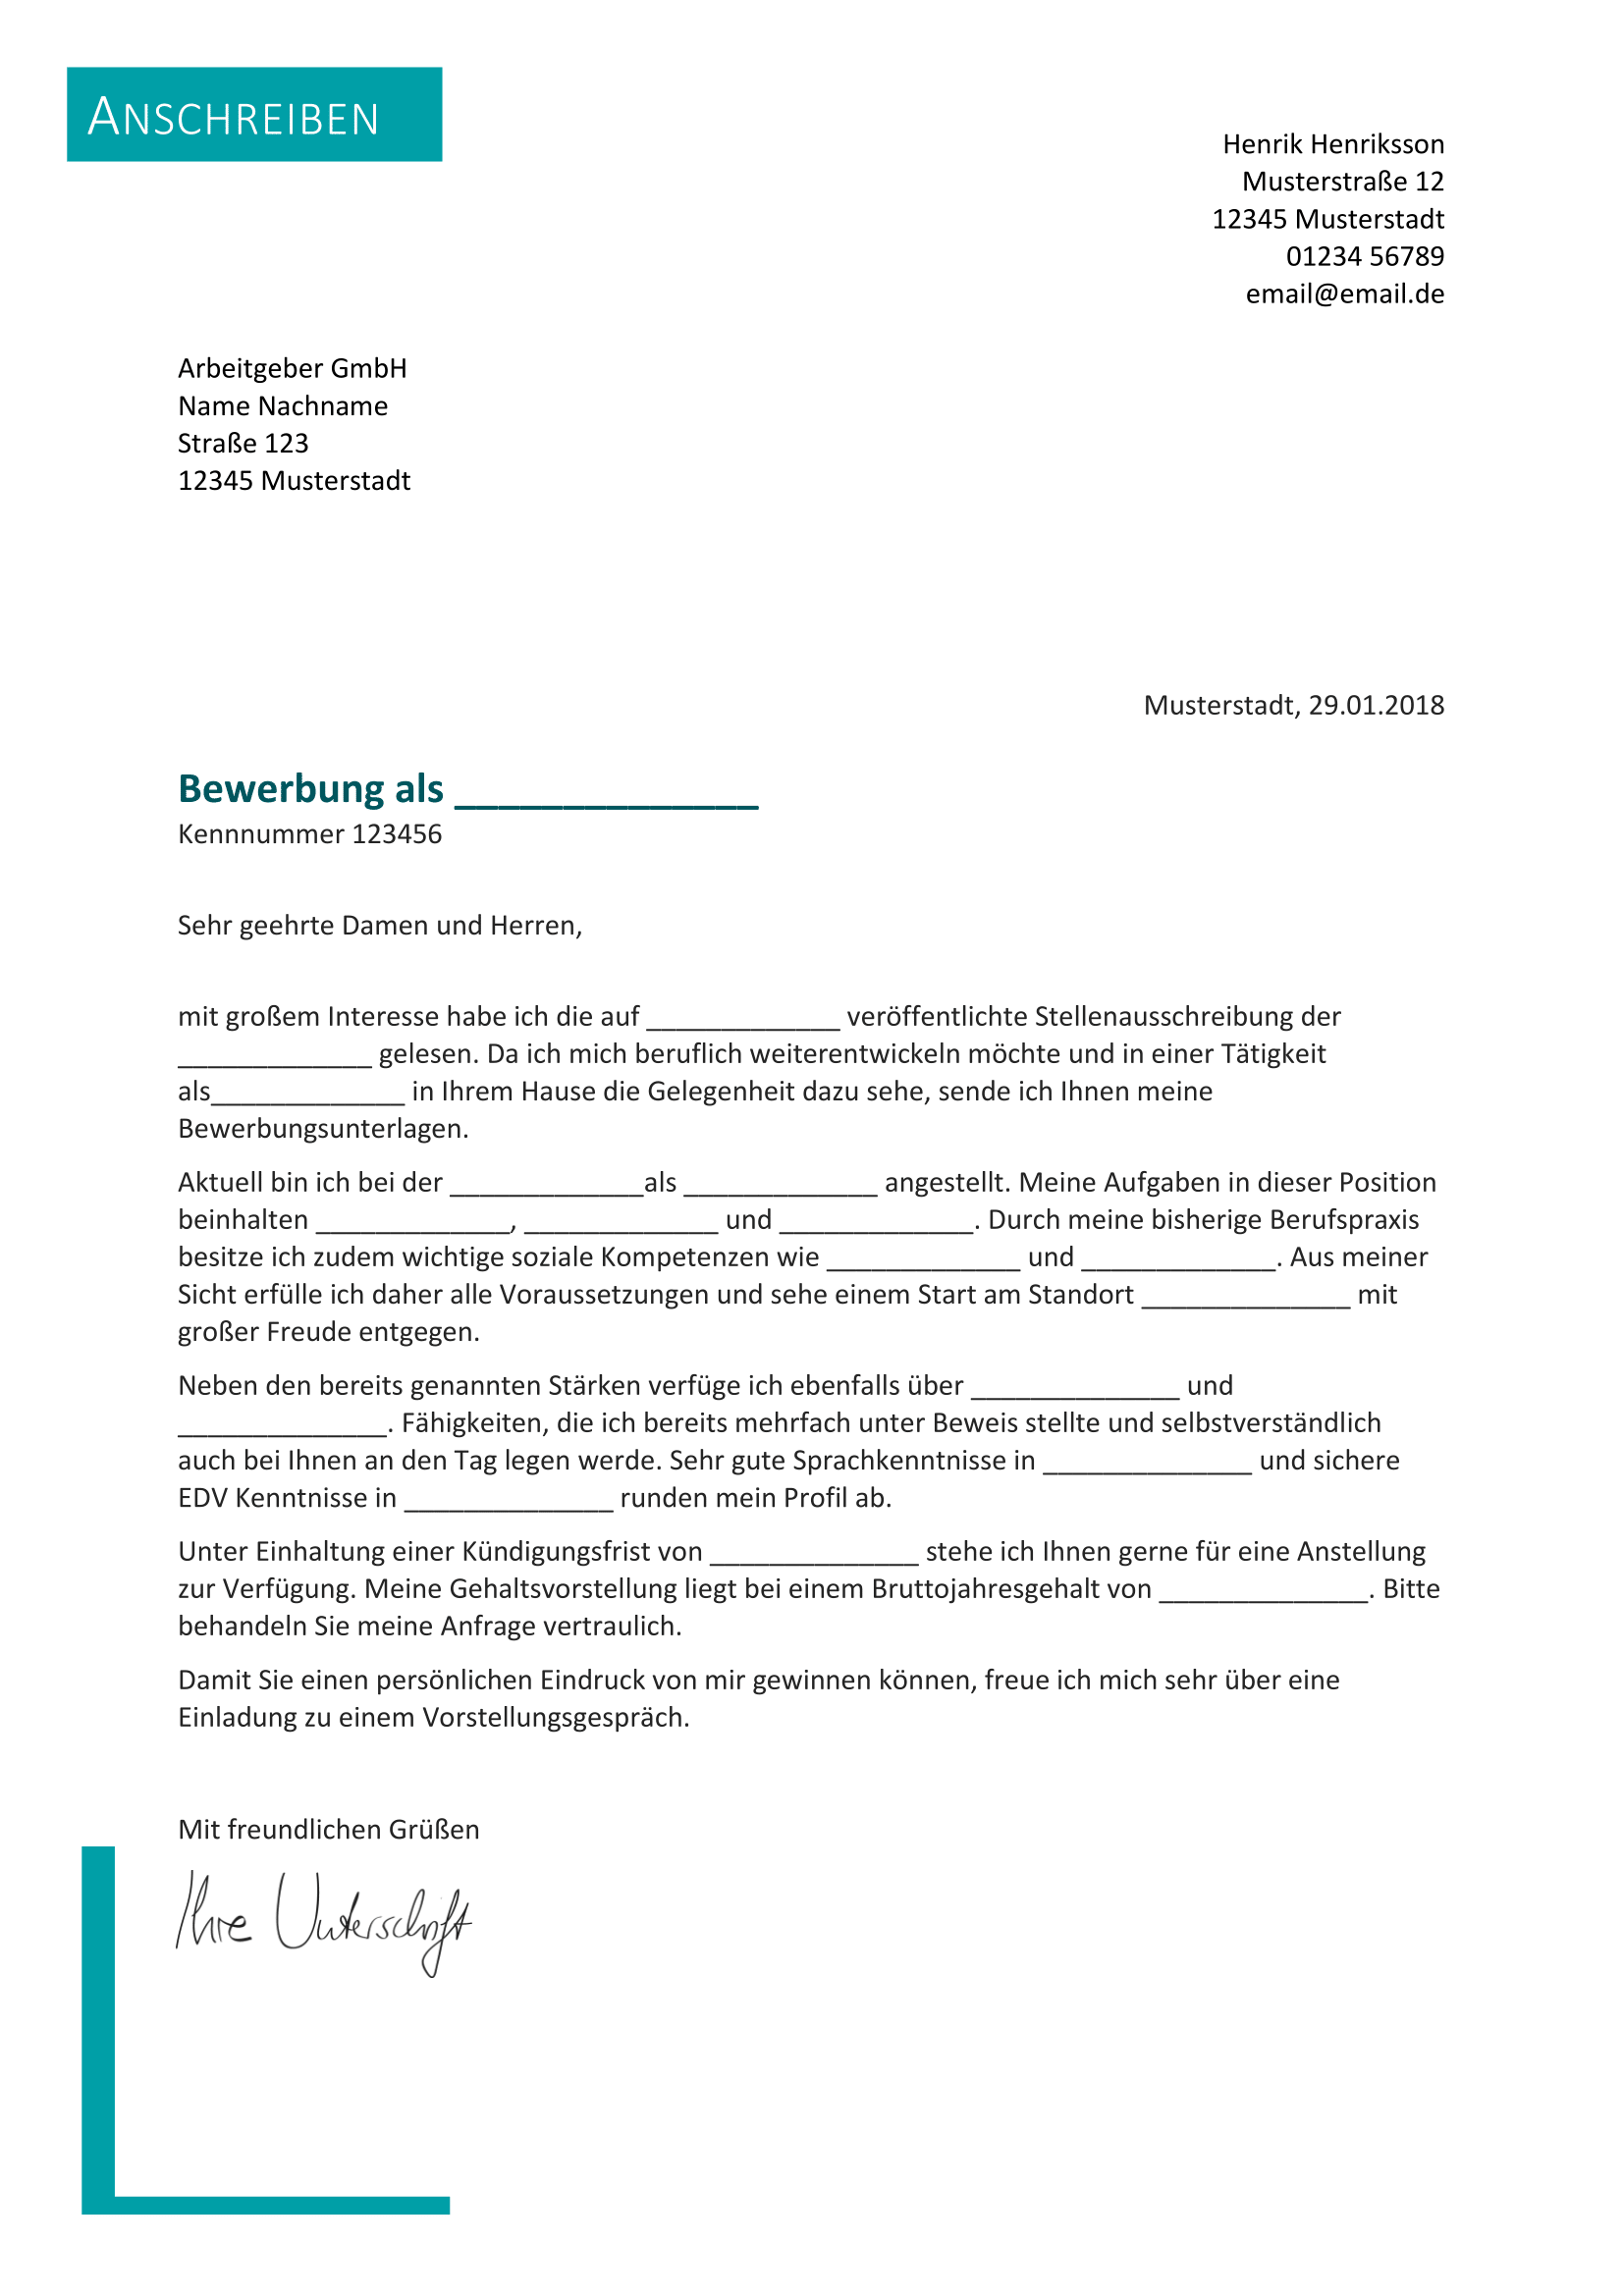 Briefprobe Briefformat Briefvorlage Bewerbung Schreiben Vorlage Bewerbung Bewerbung Anschreiben Muster